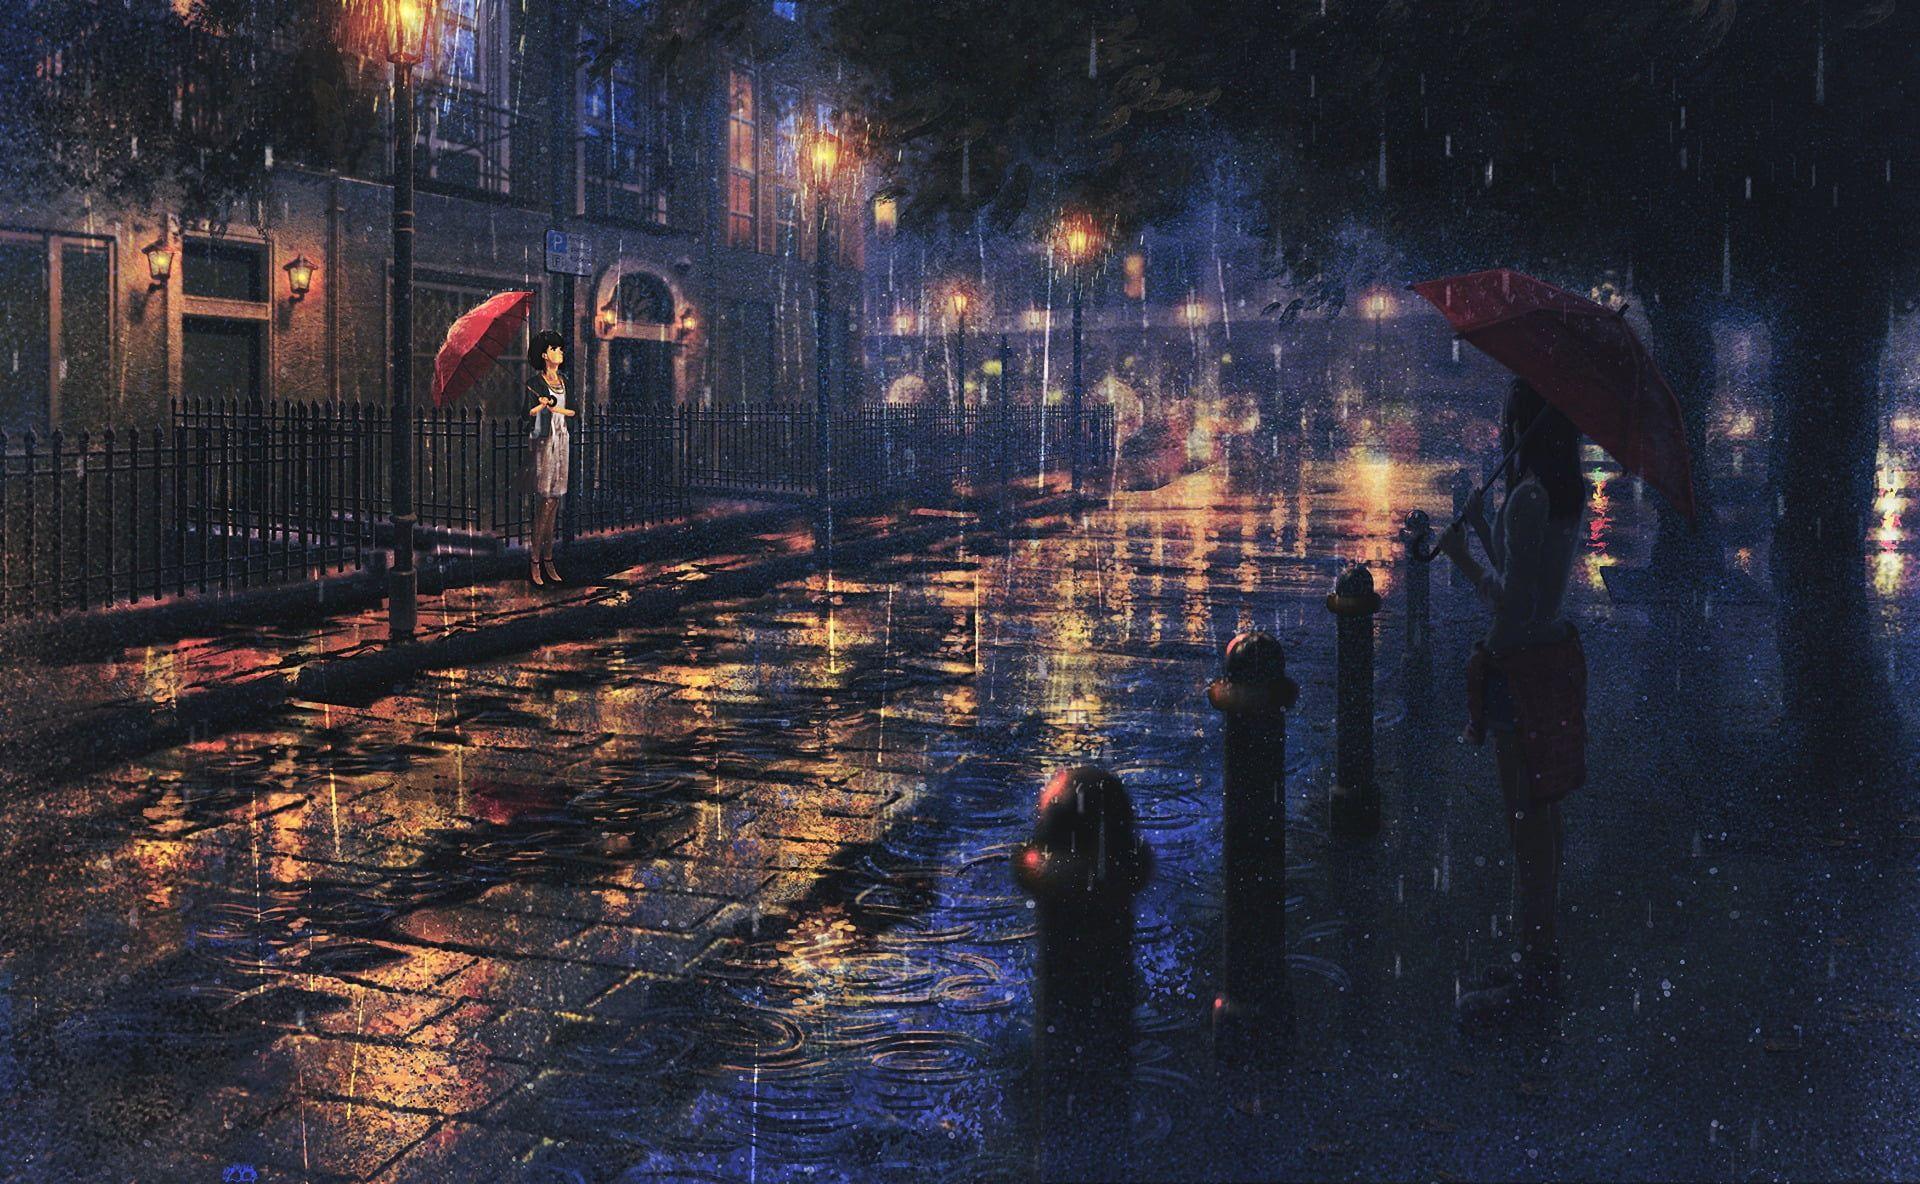 Anime Anime Girls Artwork Rain Umbrella 1080p Wallpaper Hdwallpaper Desktop Rain Wallpapers Anime Scenery Scenery Wallpaper